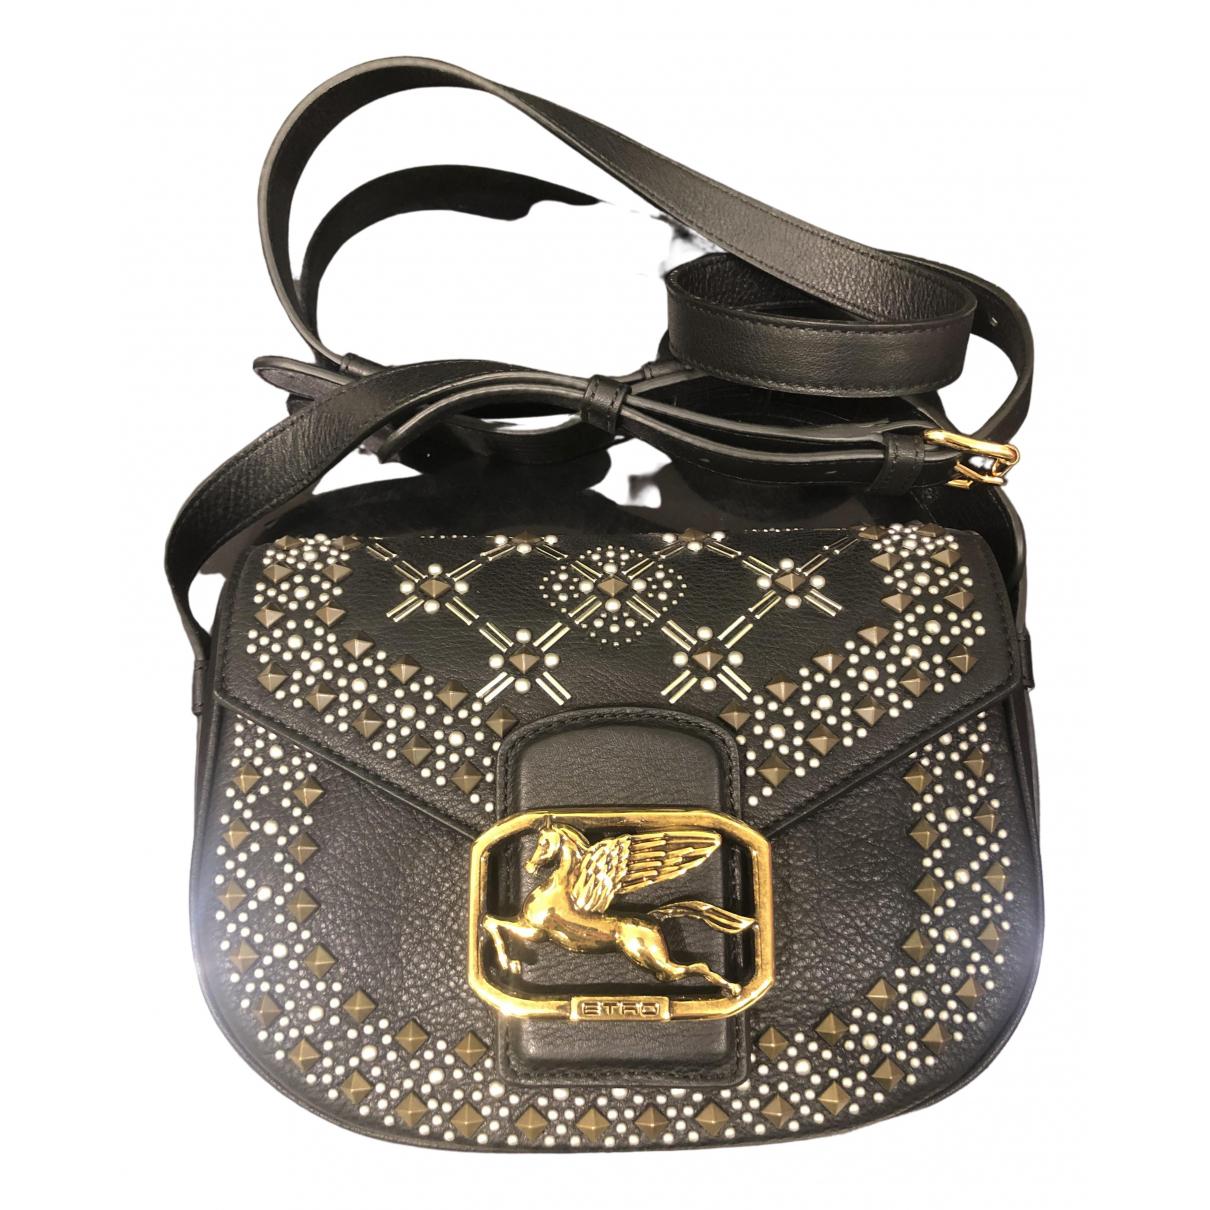 Etro \N Black Leather handbag for Women \N